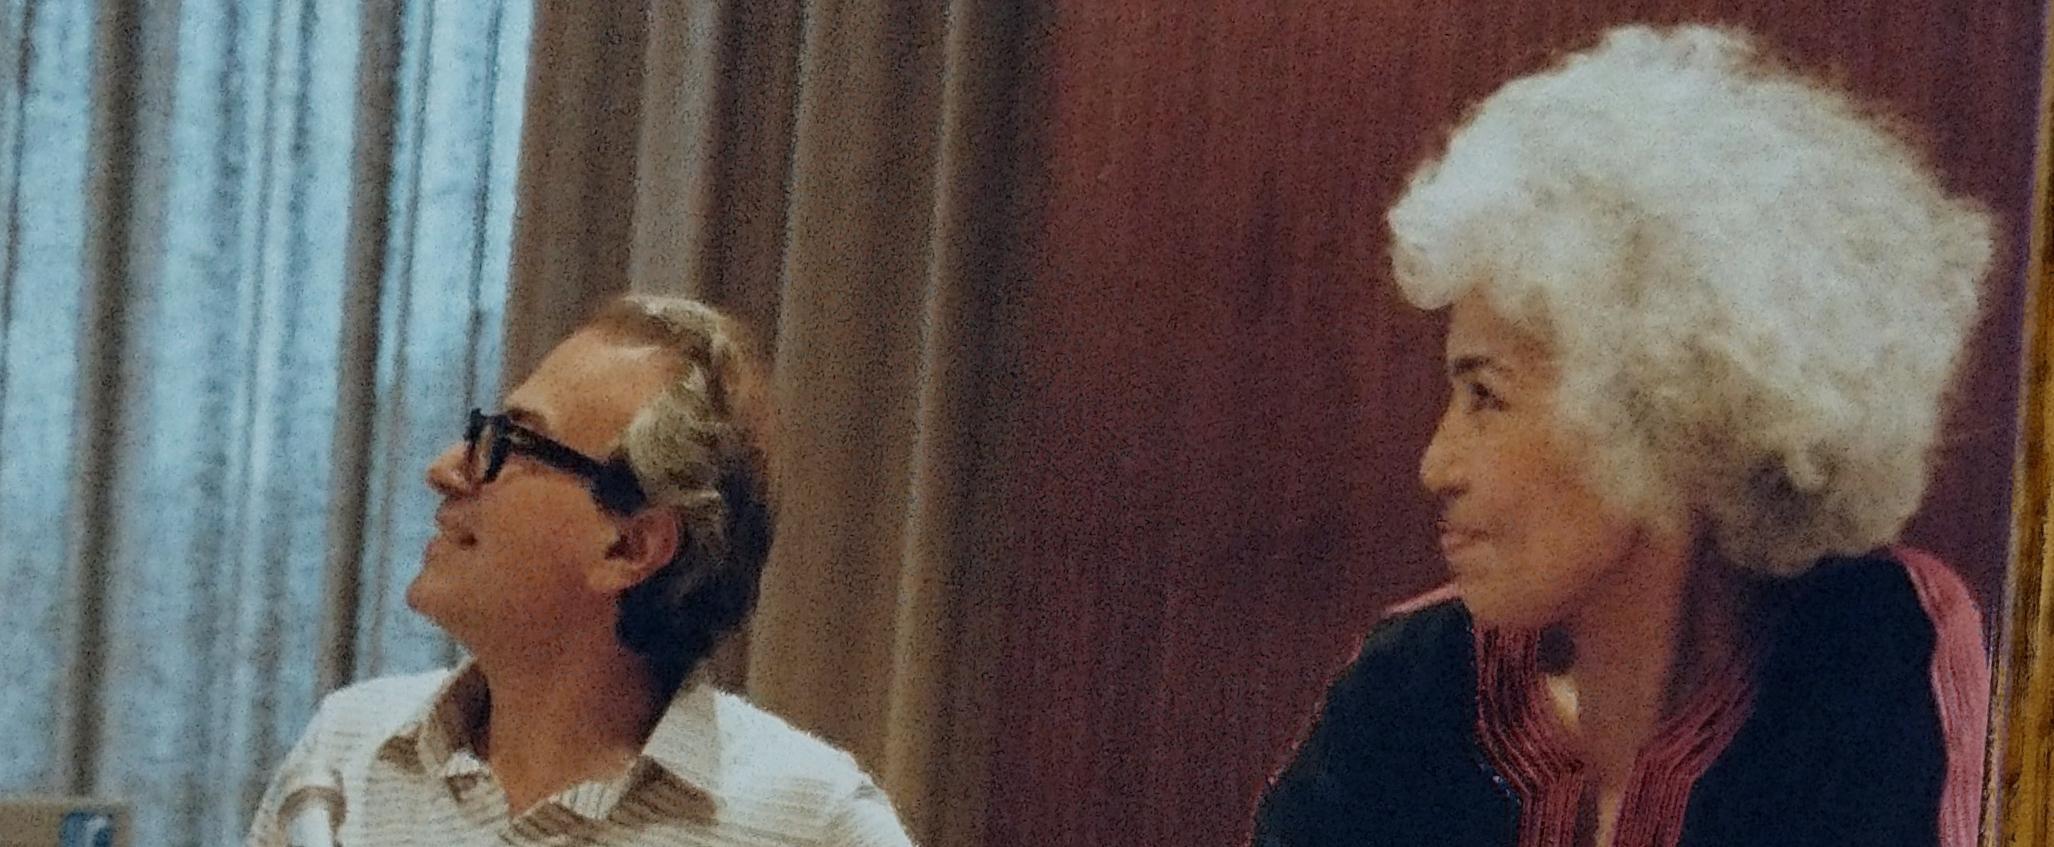 Nawal El-Saadawi: (1931-2021) radical feminist, writer, critic